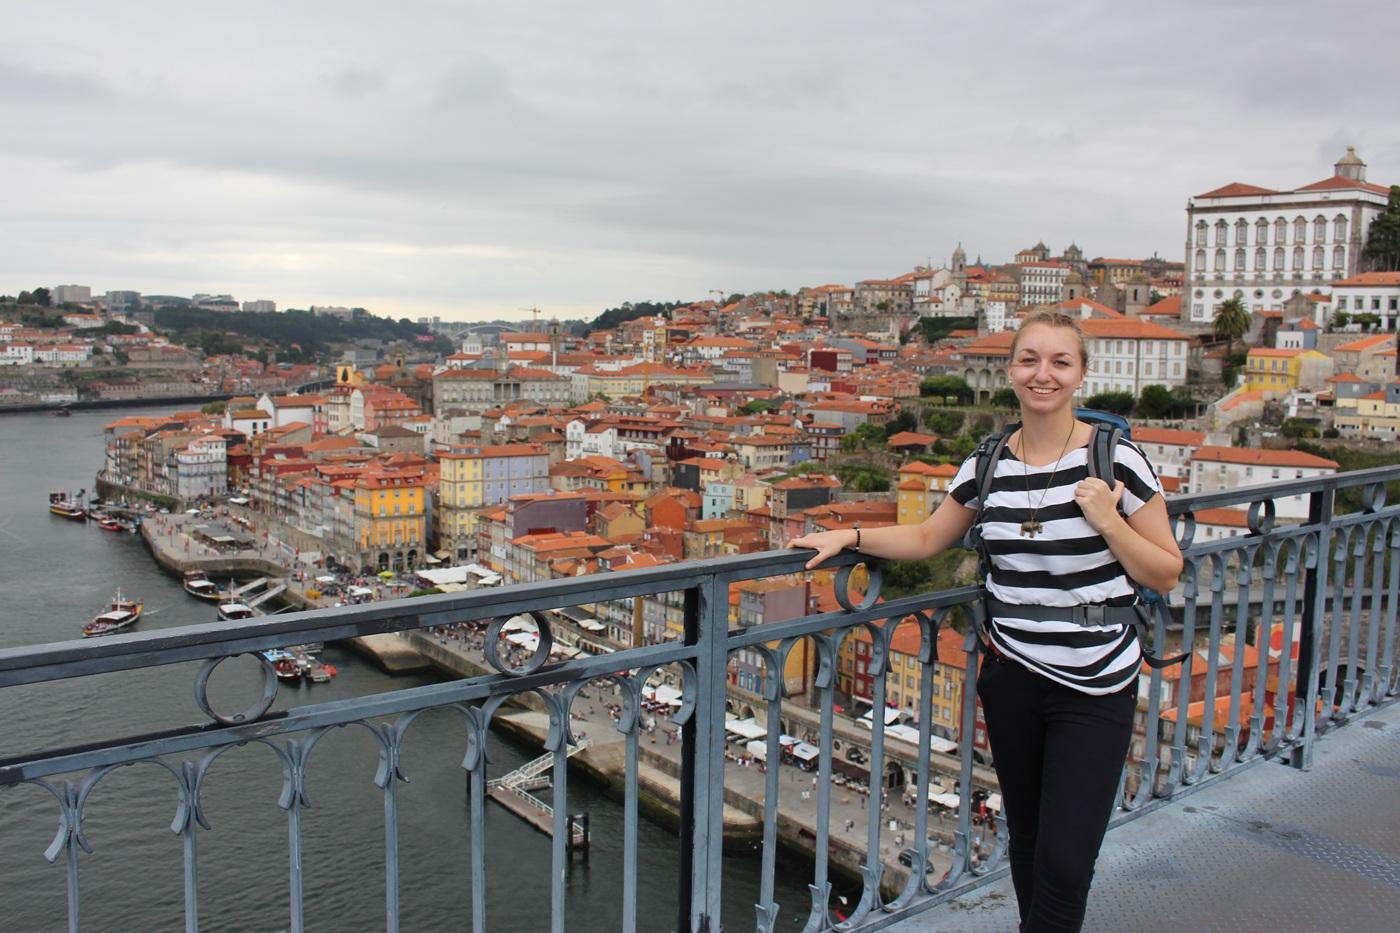 Reiseziele 2017: Die Stadt Porto